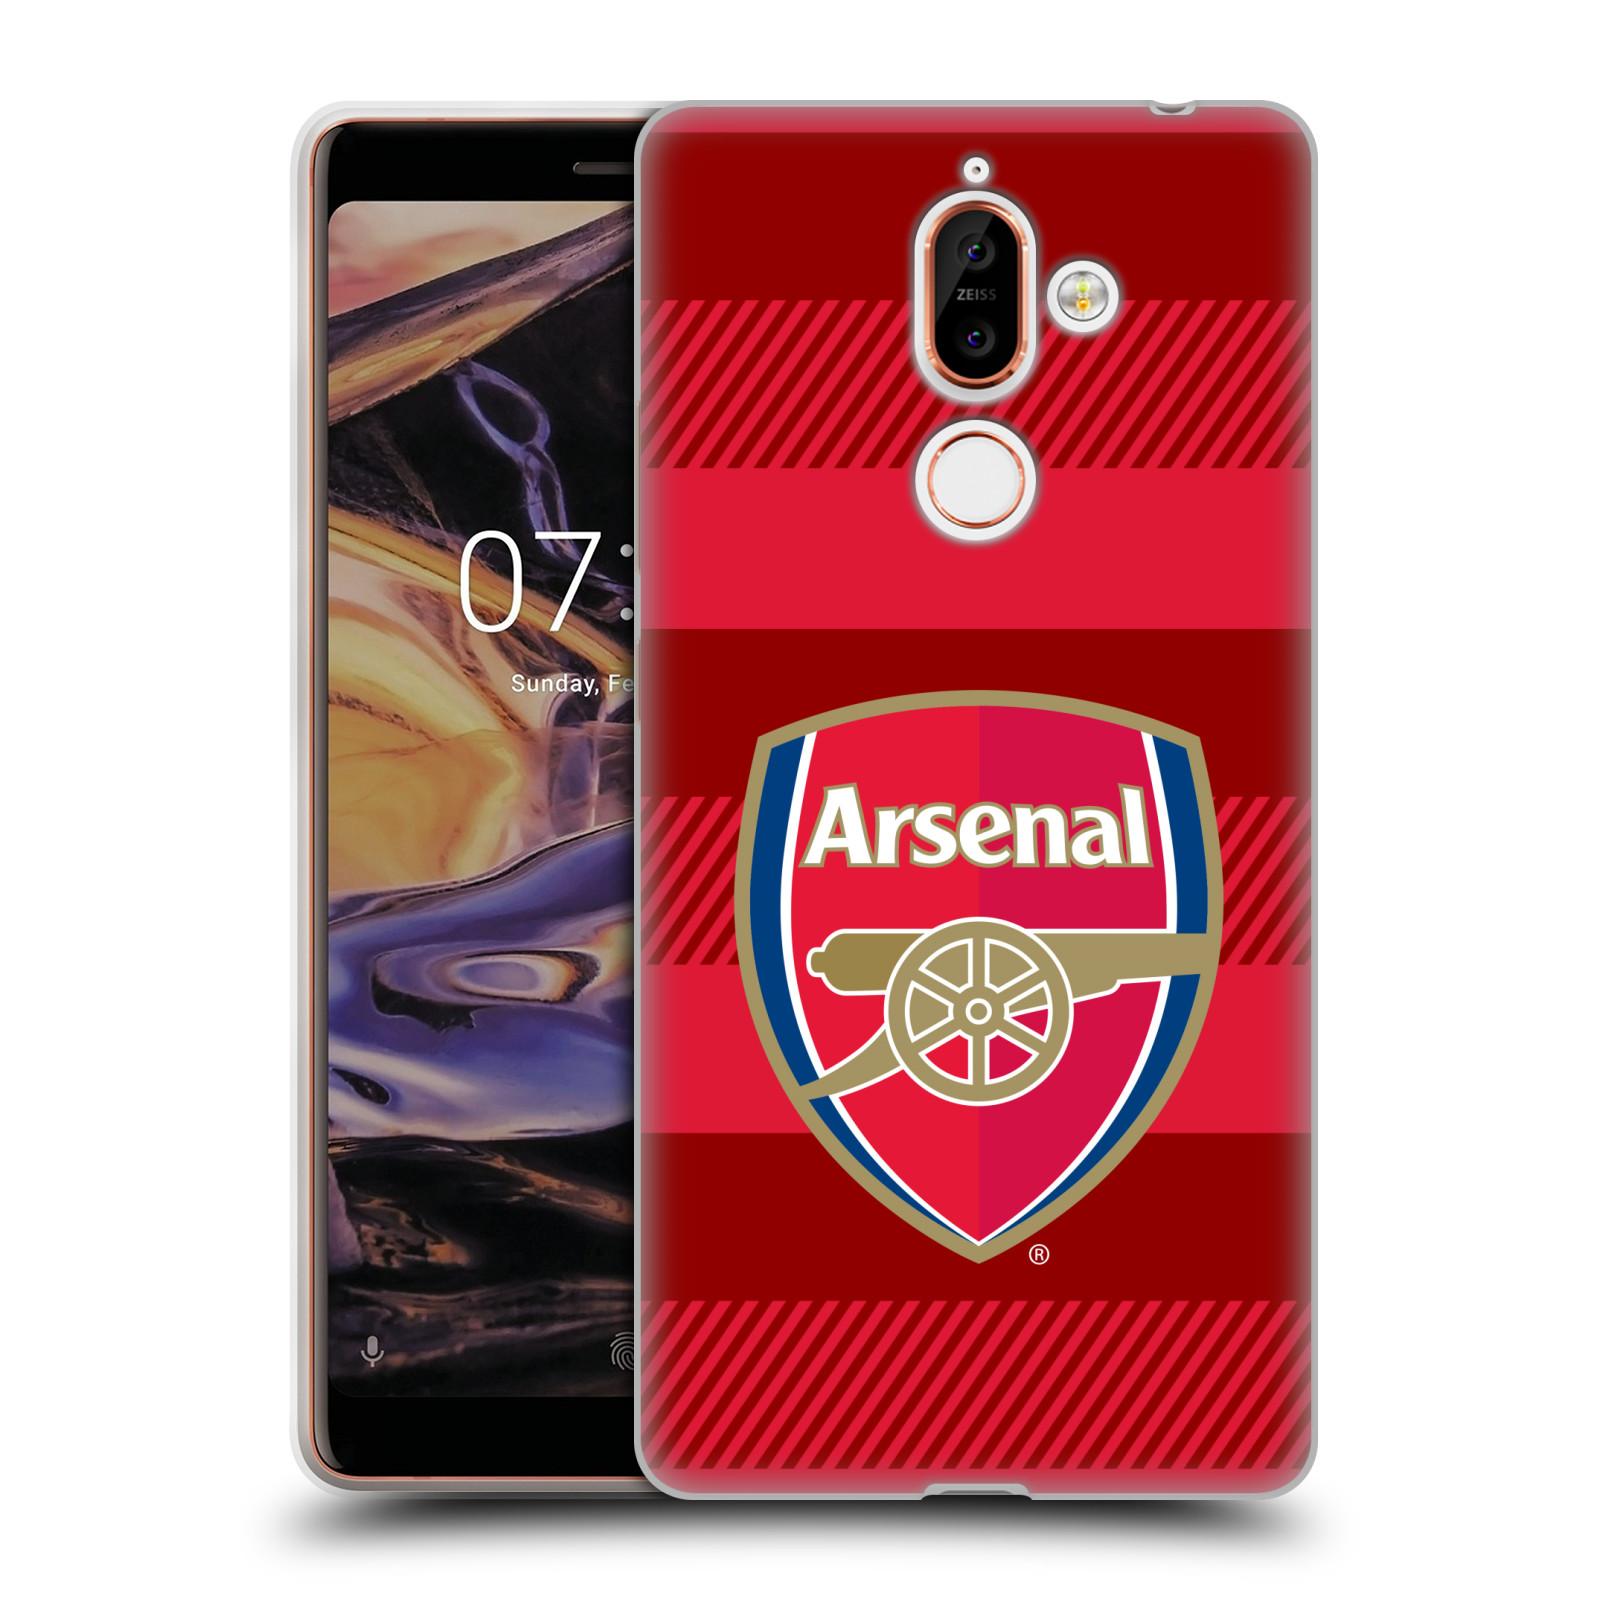 Silikonové pouzdro na mobil Nokia 7 Plus - Head Case - Arsenal FC - Logo s pruhy